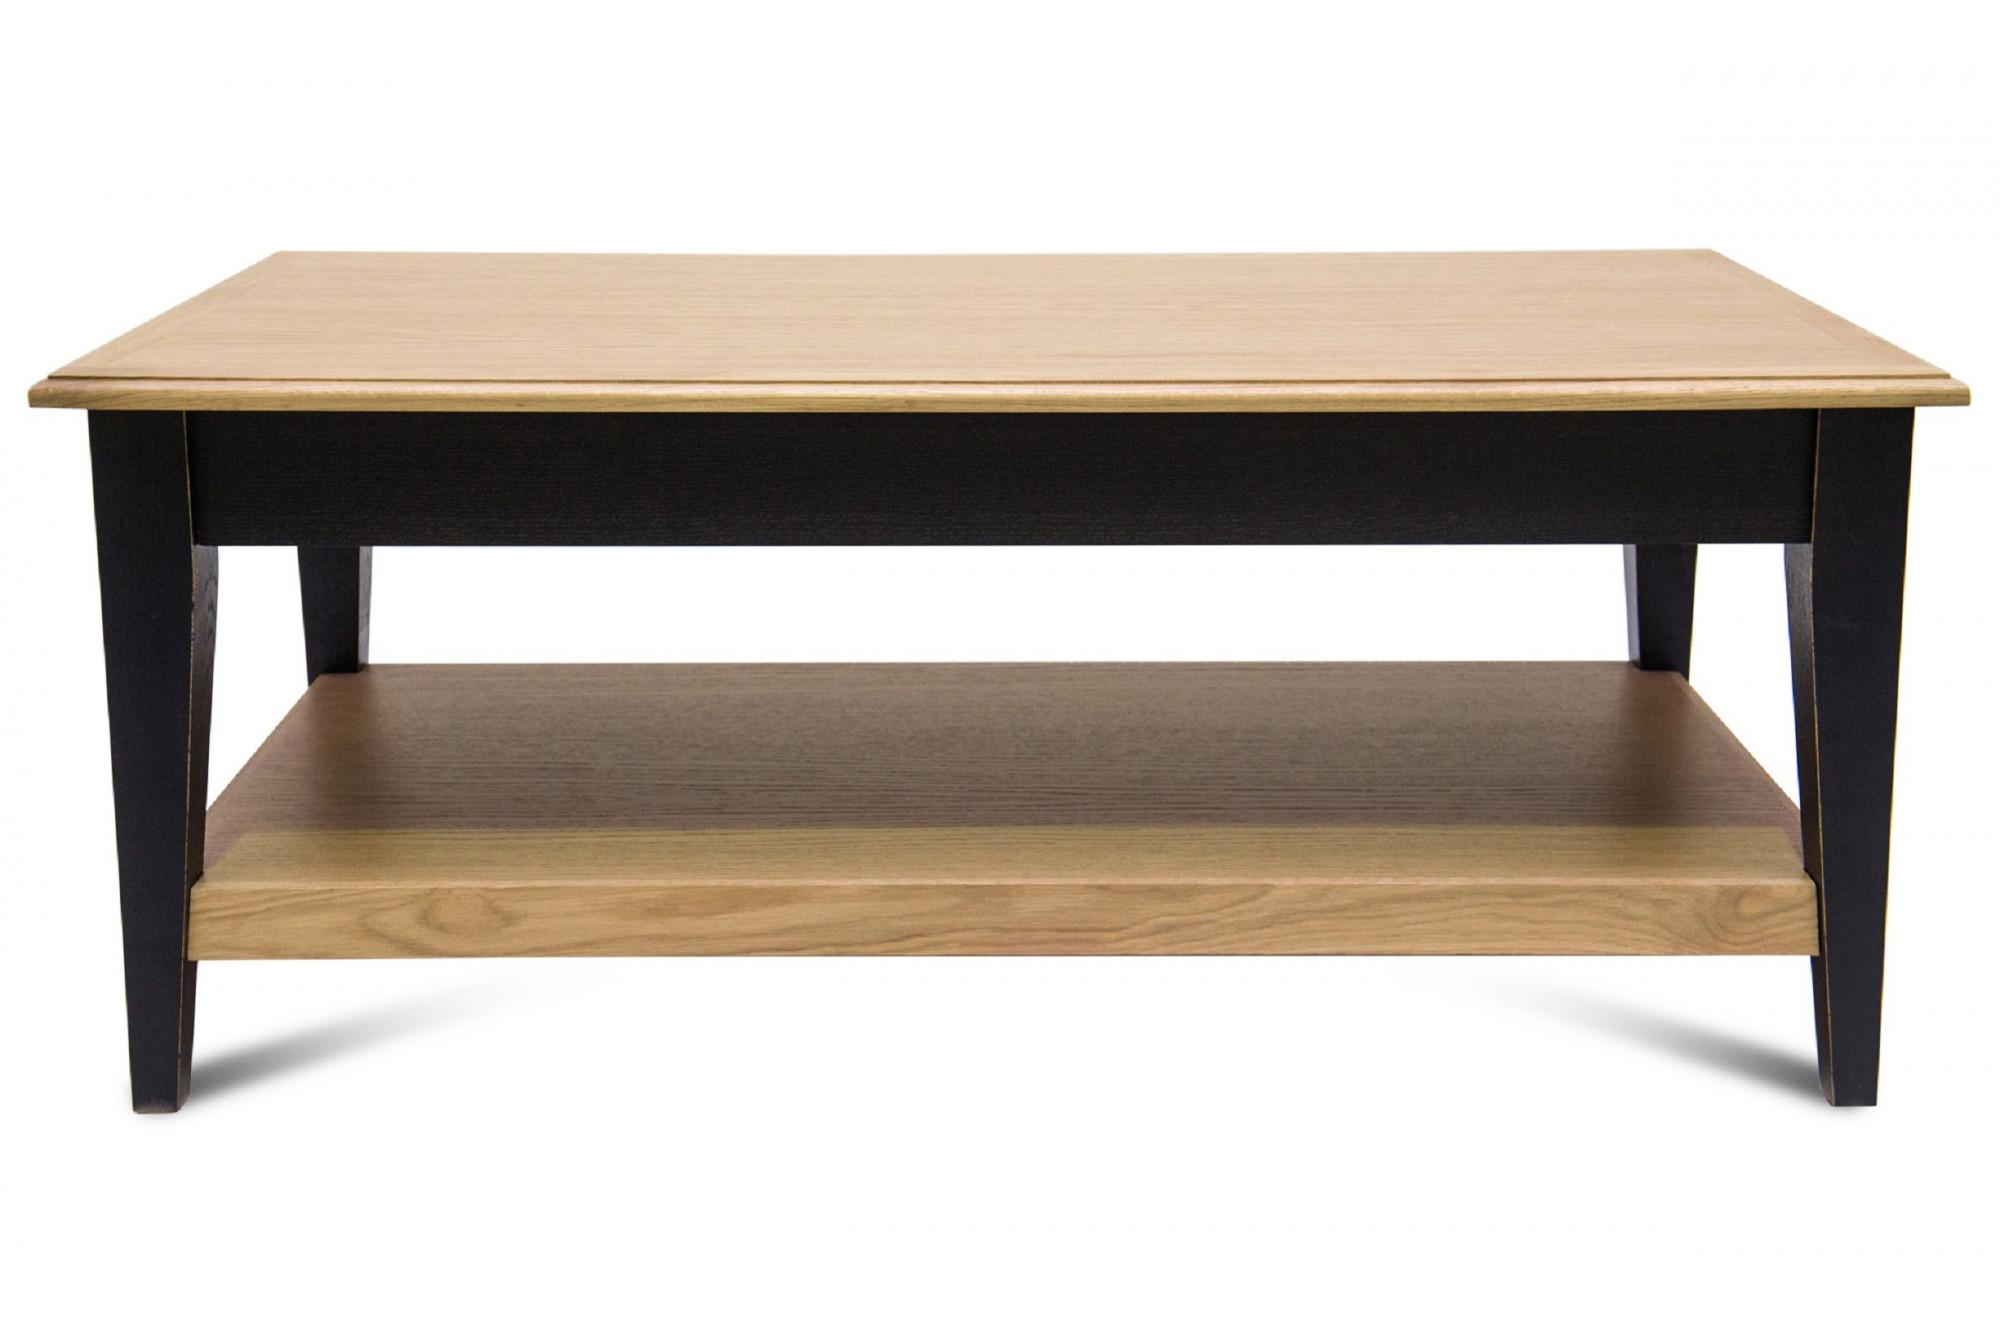 Table basse rectangulaire bois chene